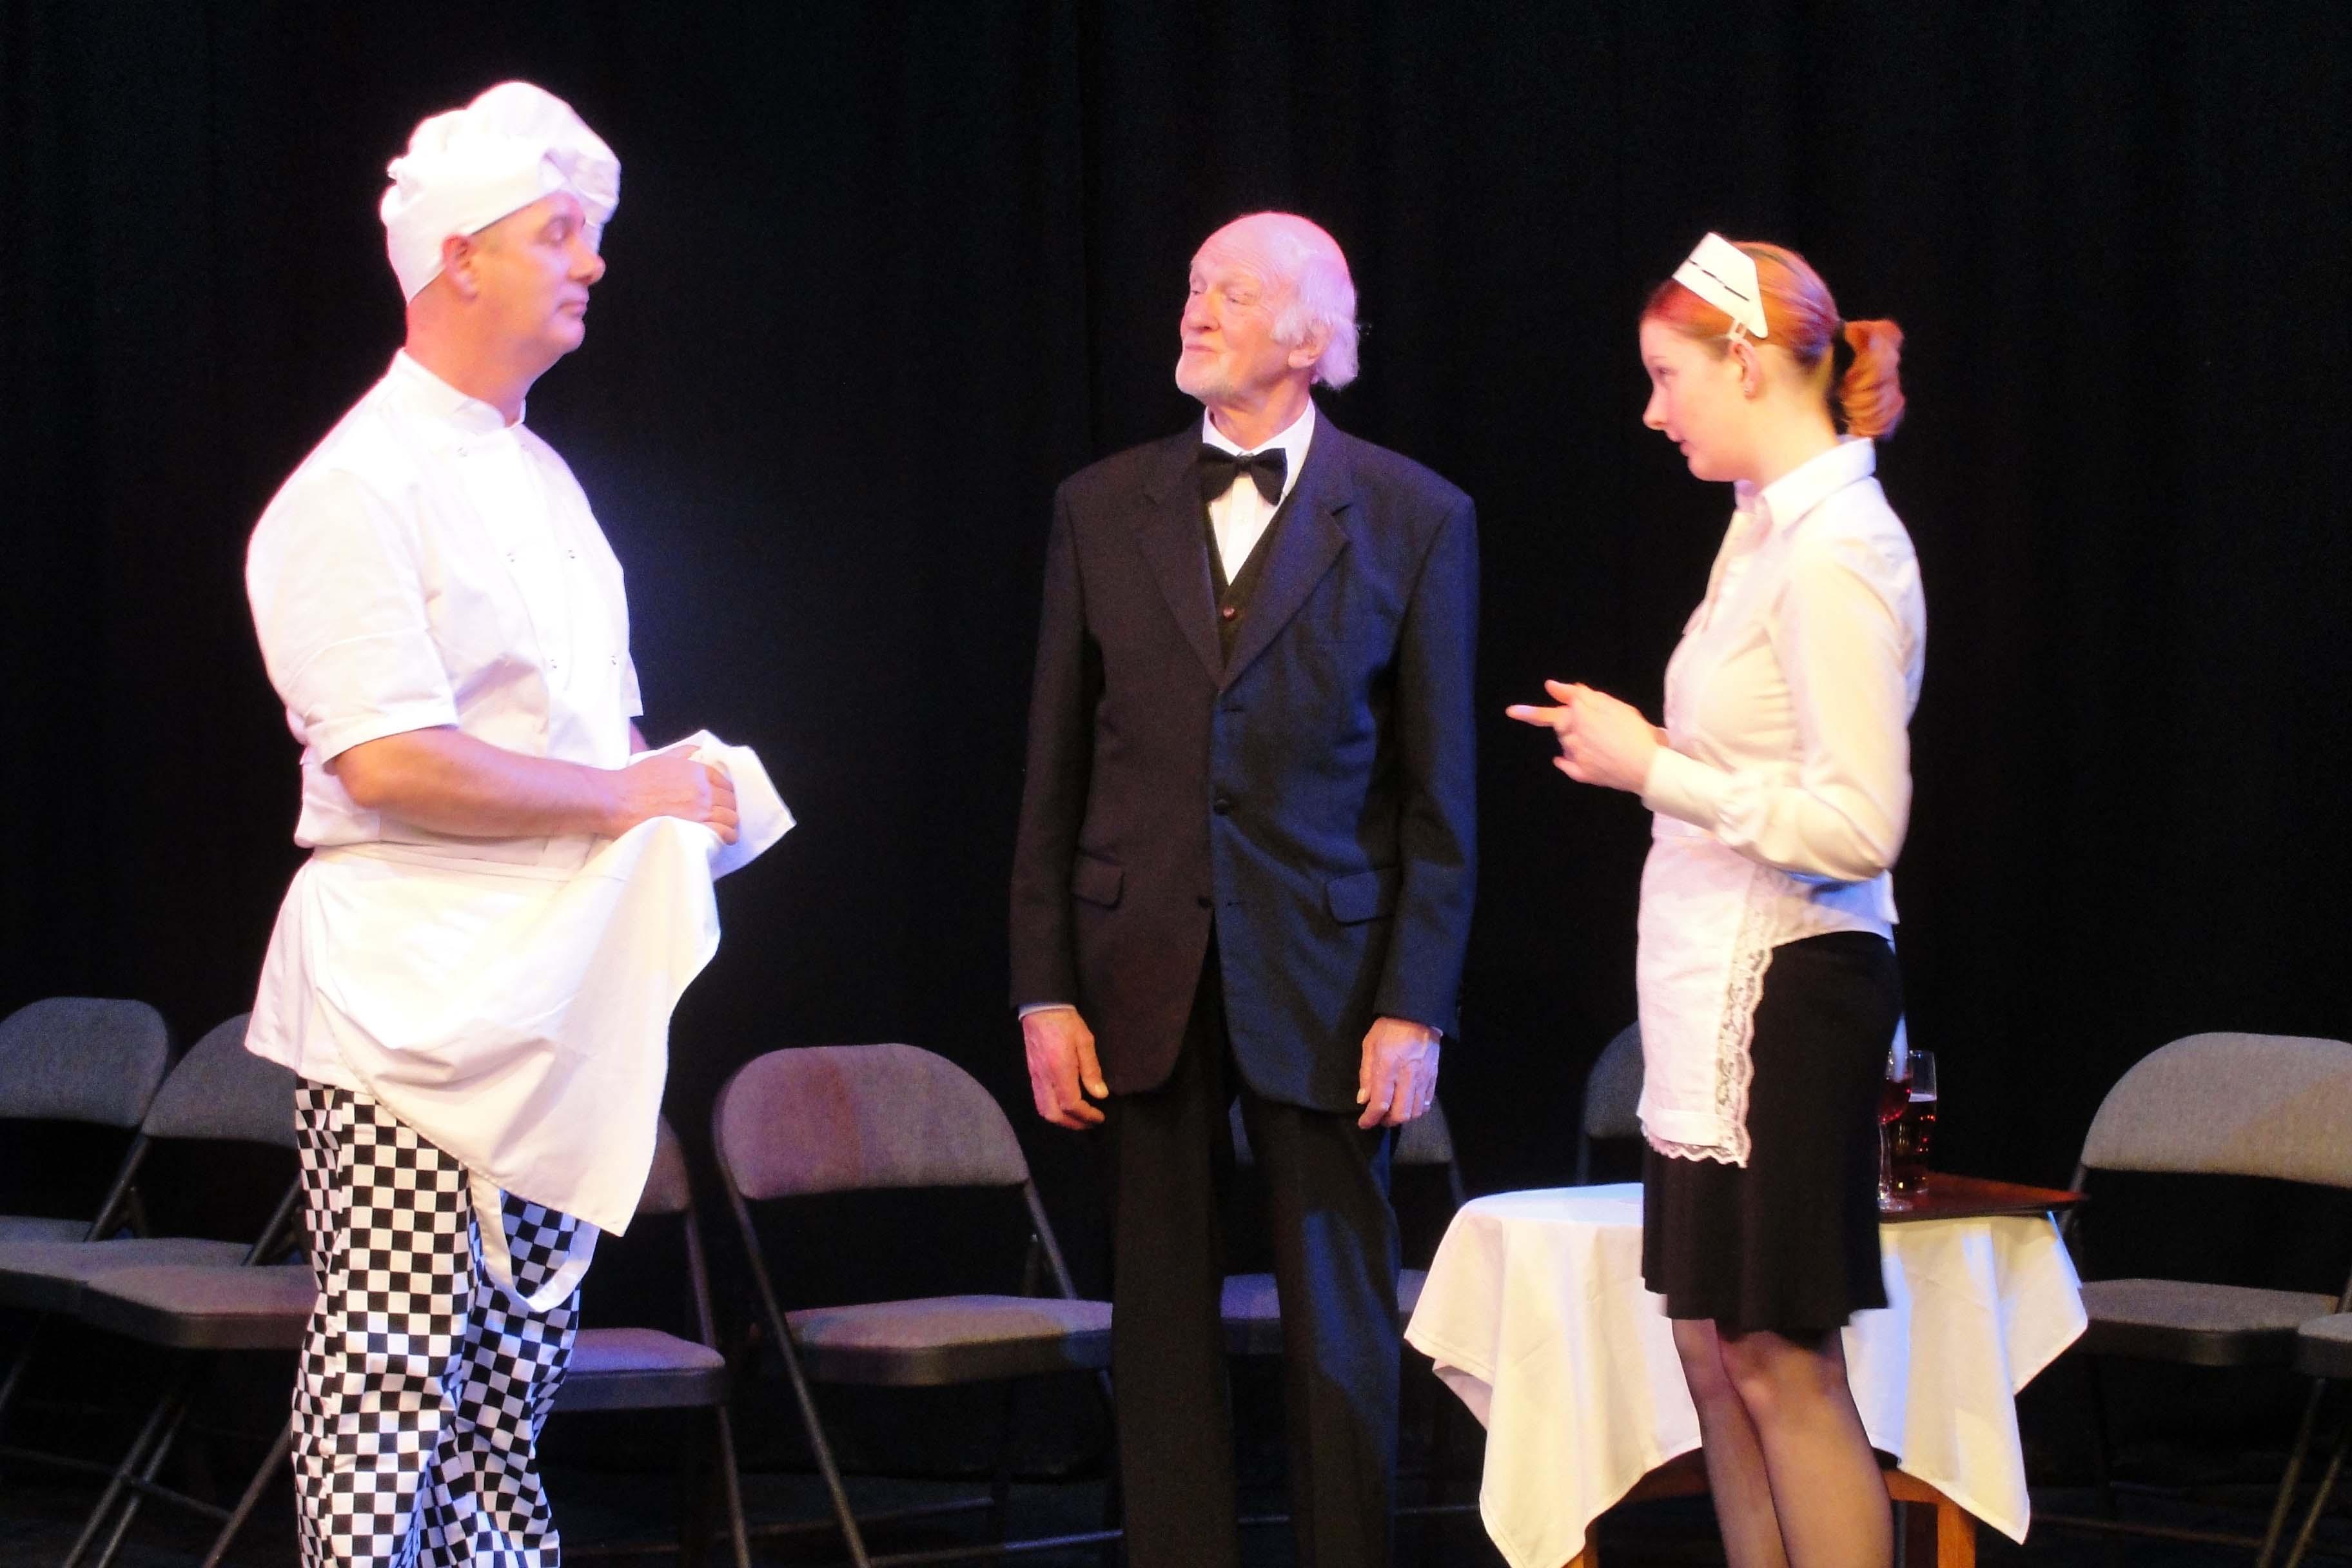 201210 Last Tango in Whitby (17)